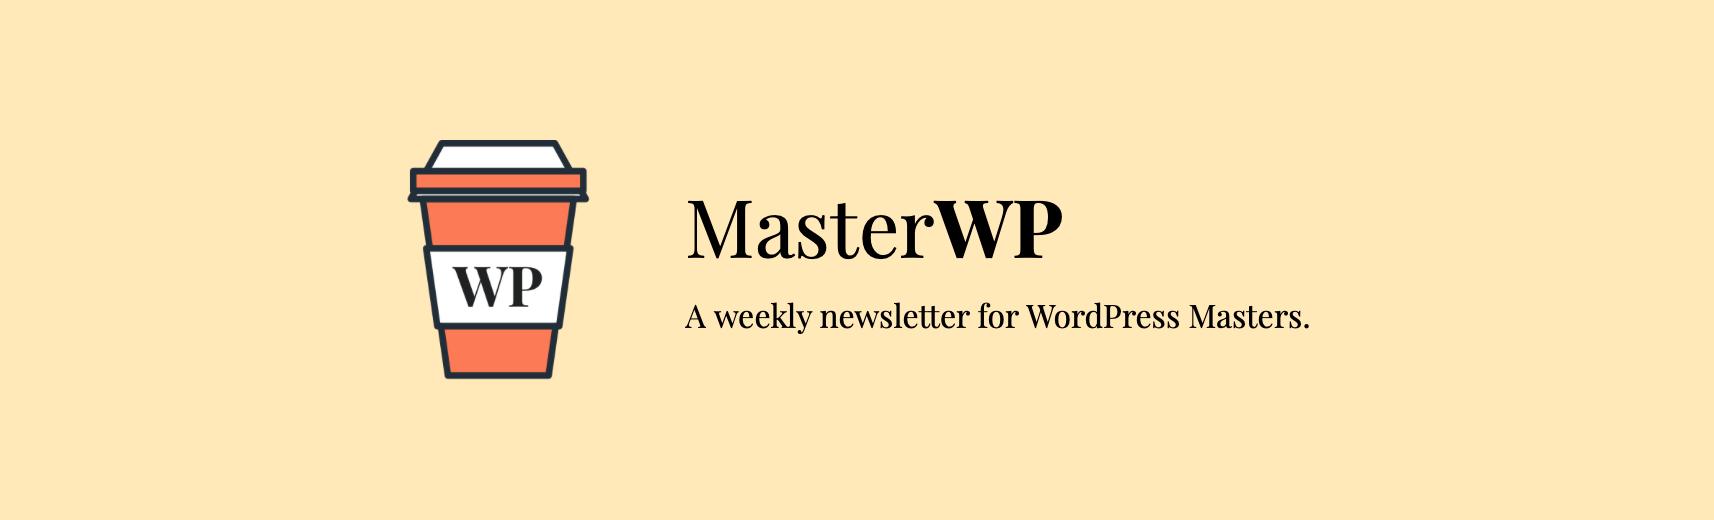 MasterWP通讯横幅。